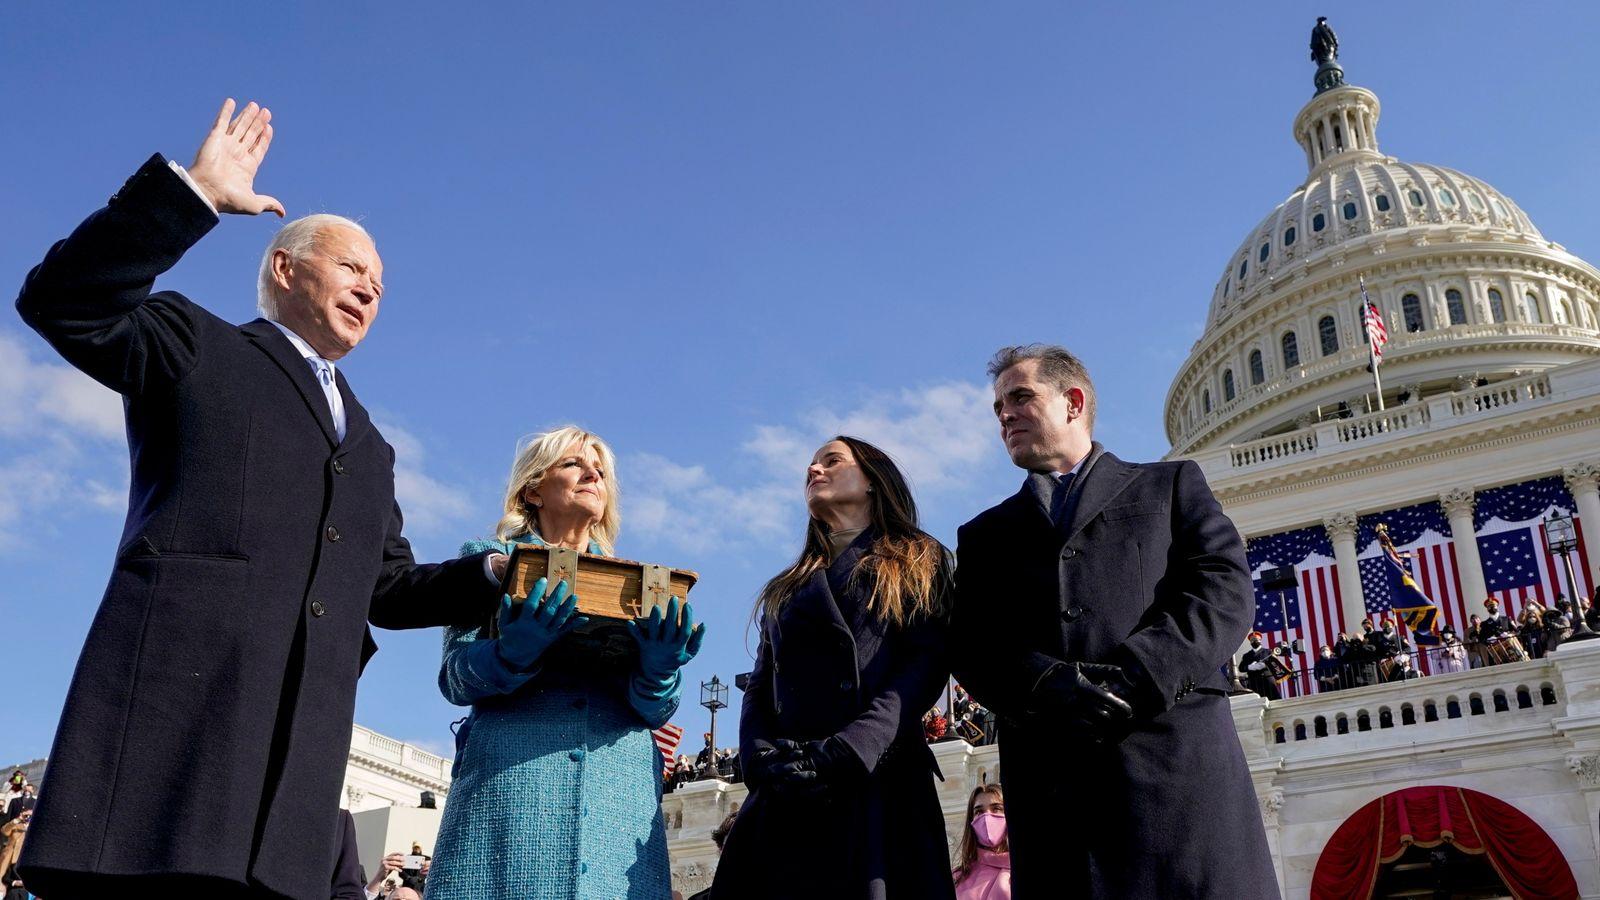 Biden and Harris inauguration live: Watch Joe Biden